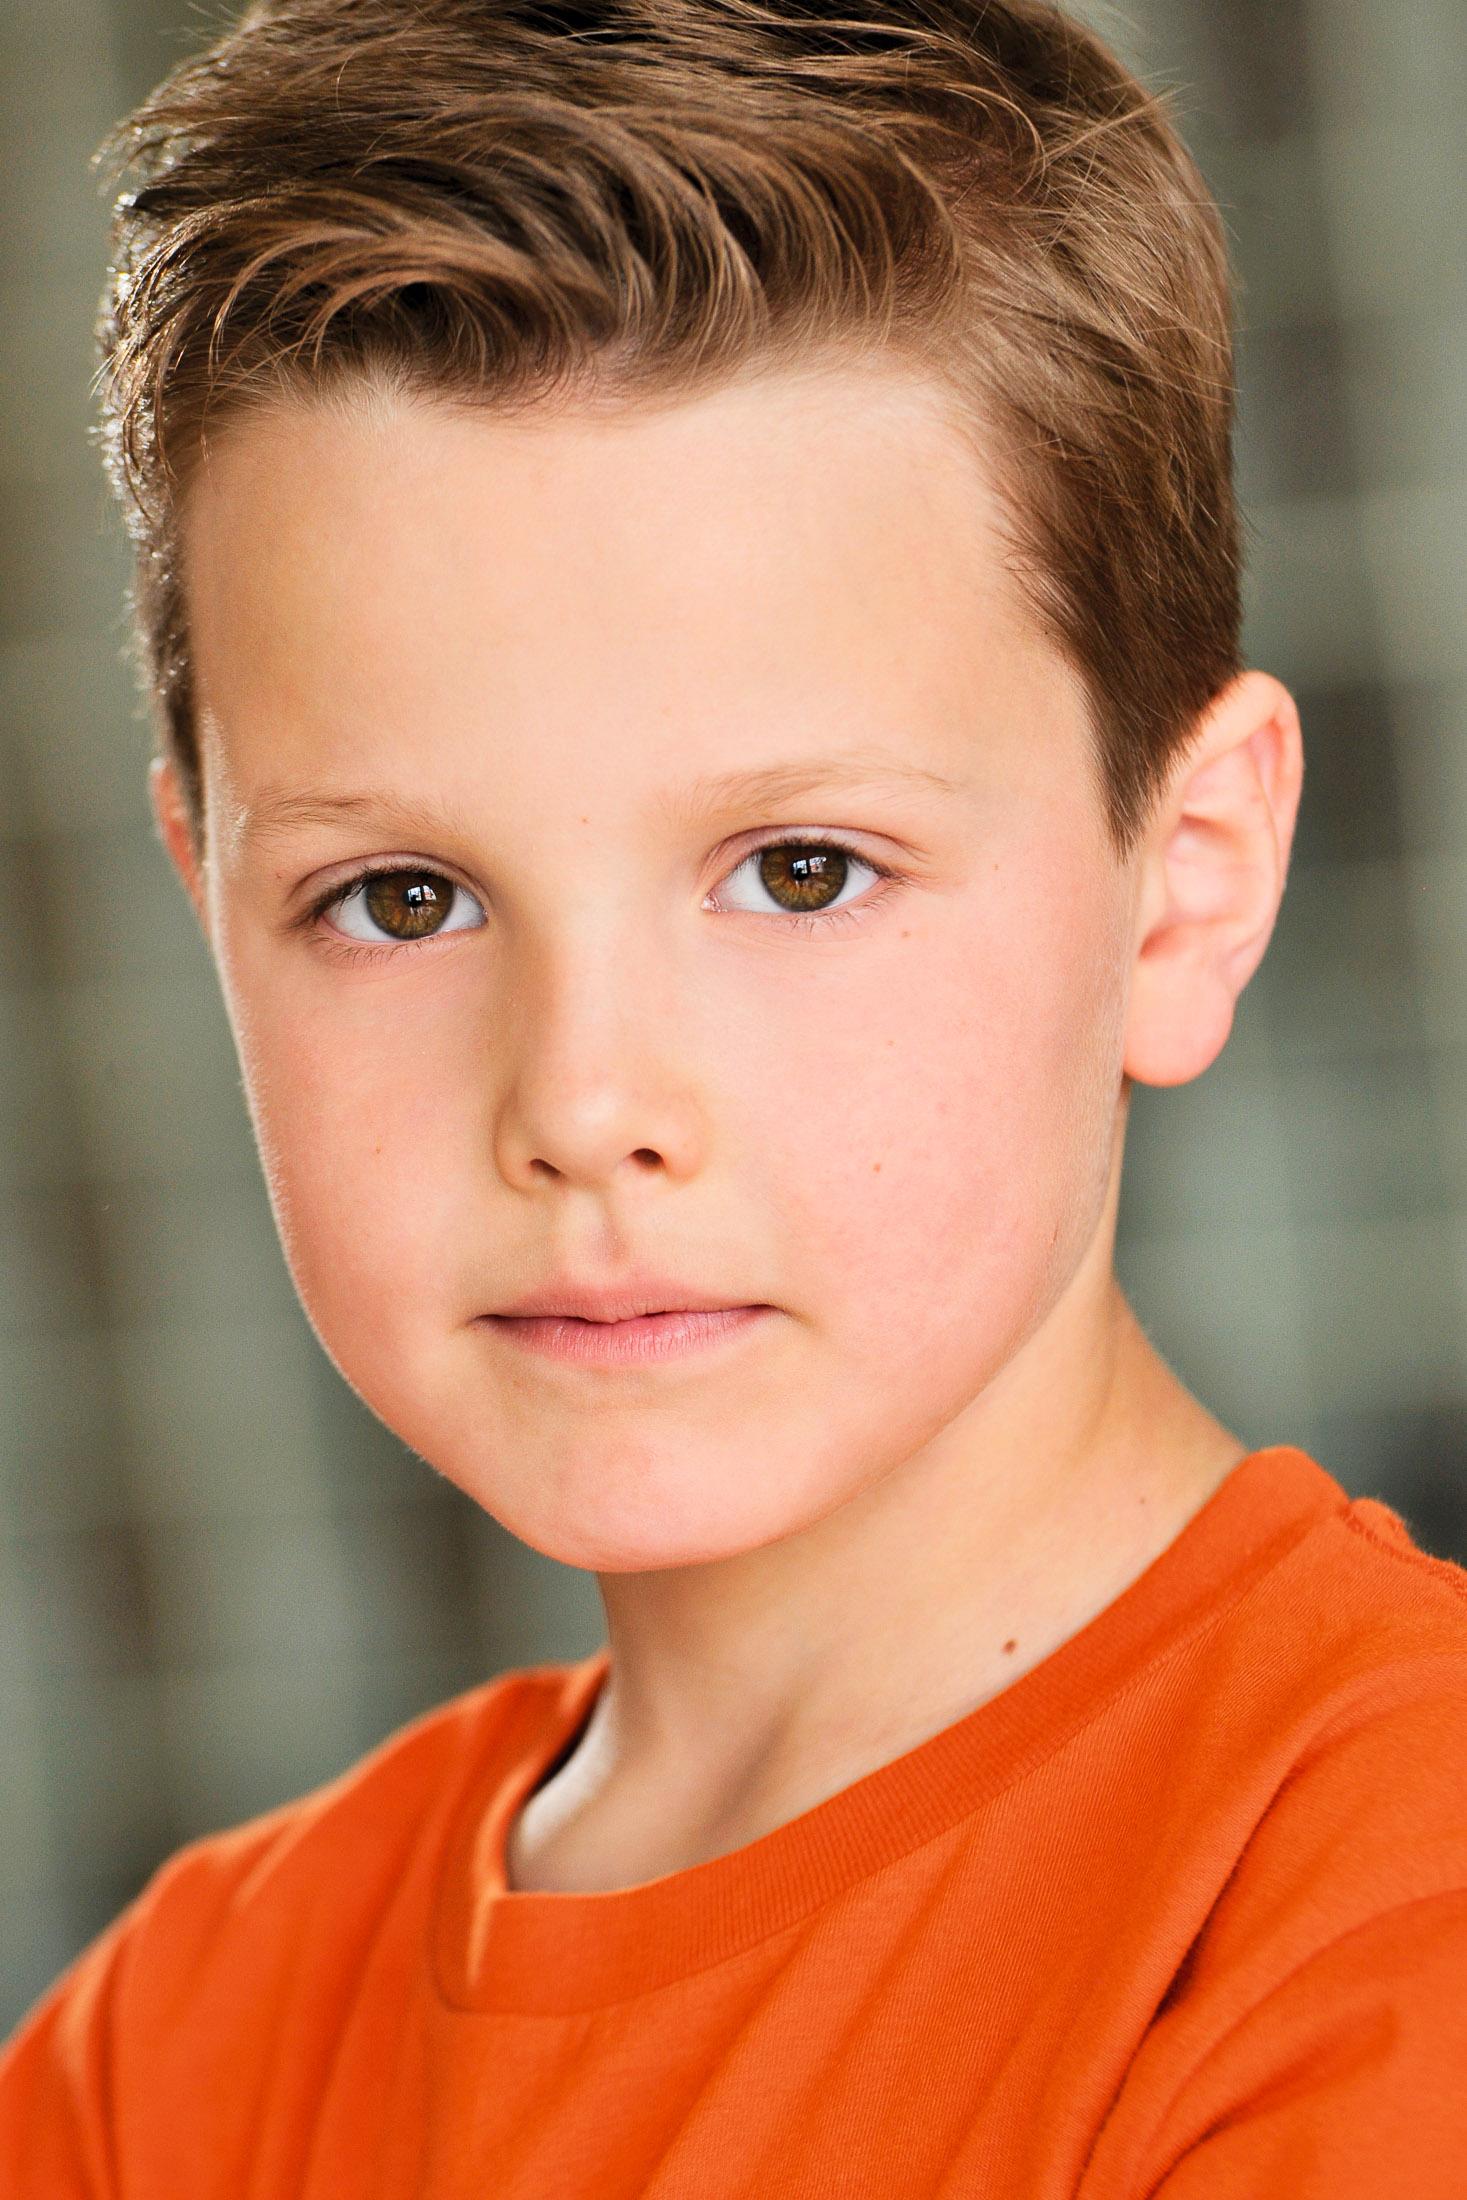 Headshots NYC - Actor Headshots Tristan C